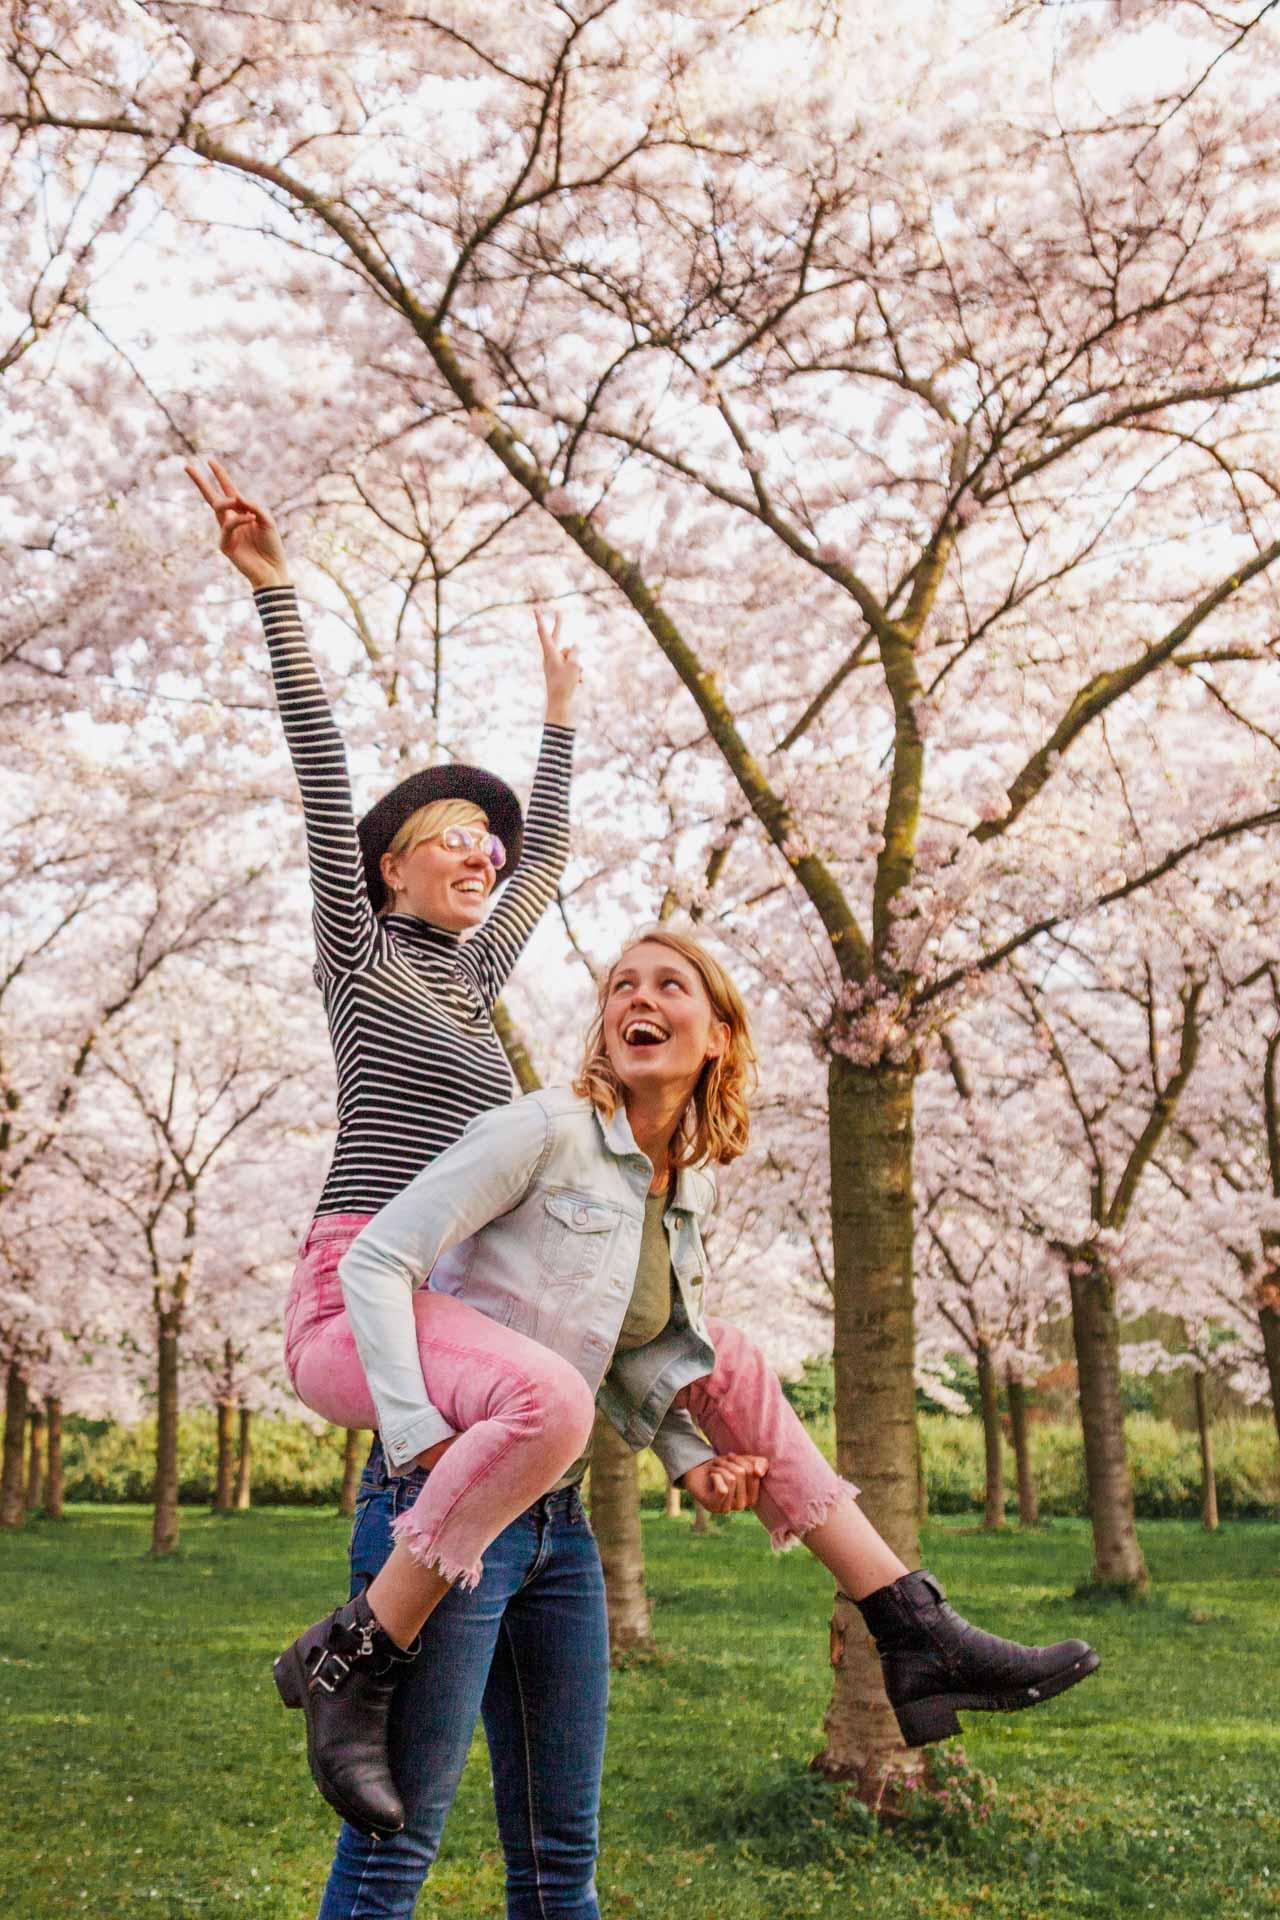 Sakura, Cherry Blossom, Kersenbloesemtuin, Amsterdamse Bos